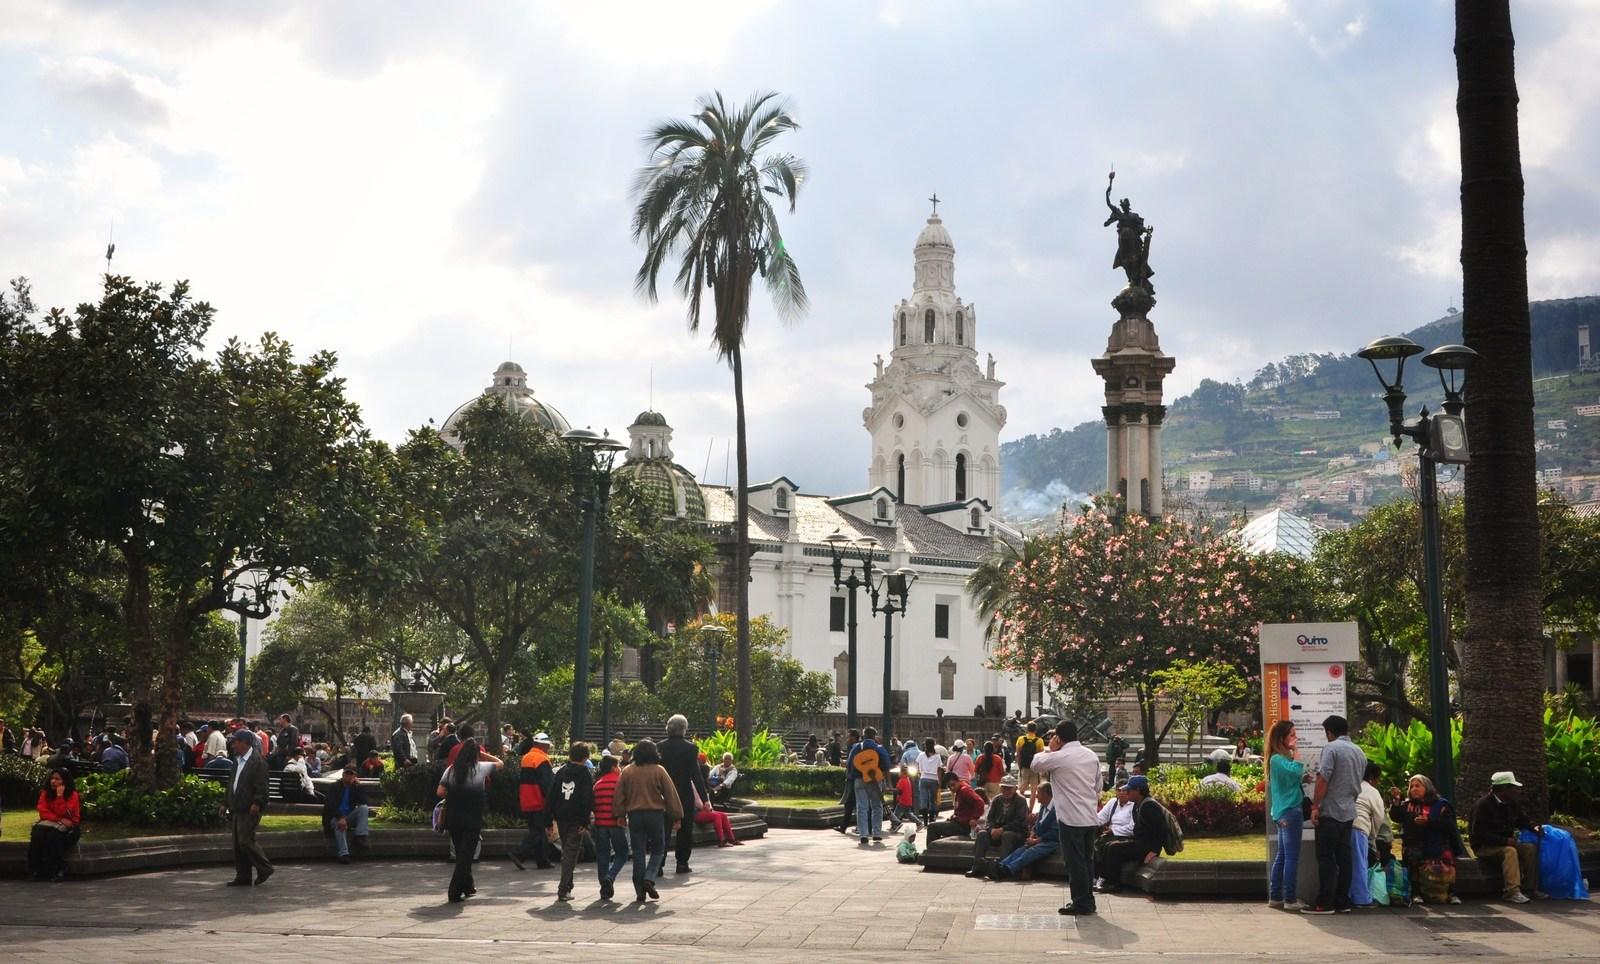 Parque central de Quito Quito